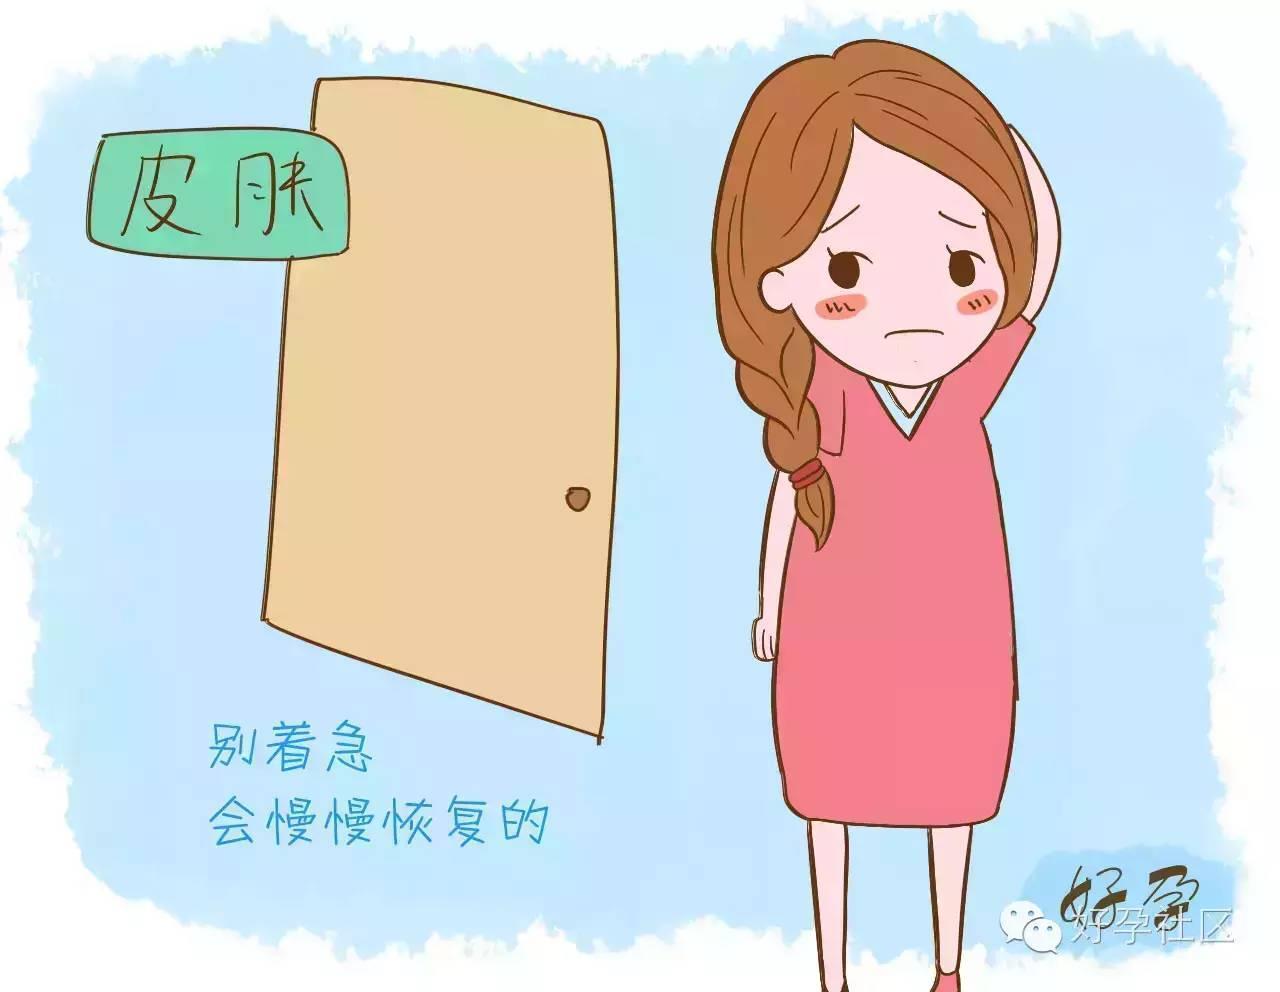 a女人!怀孕后女人的部位隐私竟然越来越黑!広妻子板场杏漫画图片